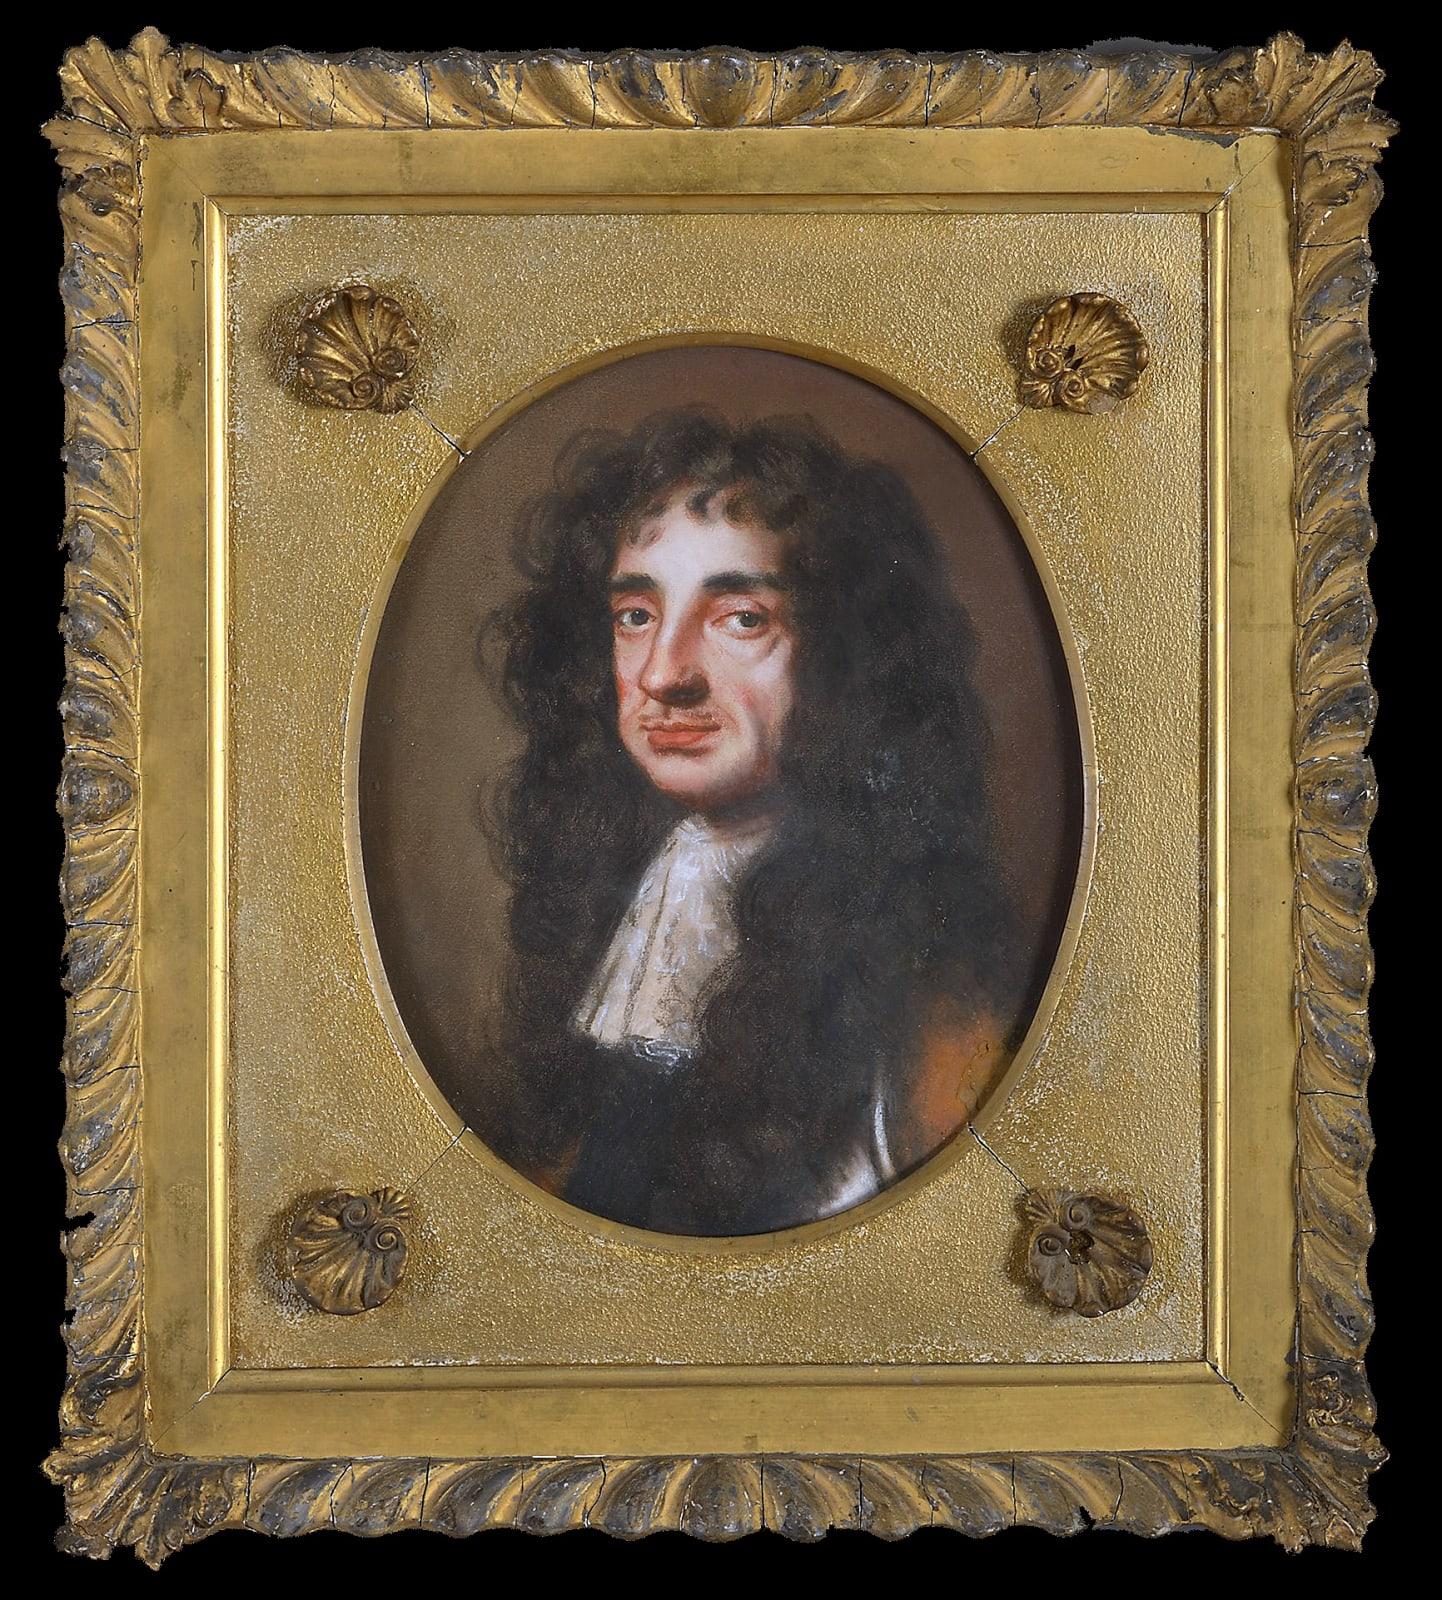 Edmund Ashfield (1640 - 1678), King Charles II (1630 - 1685), c.1675